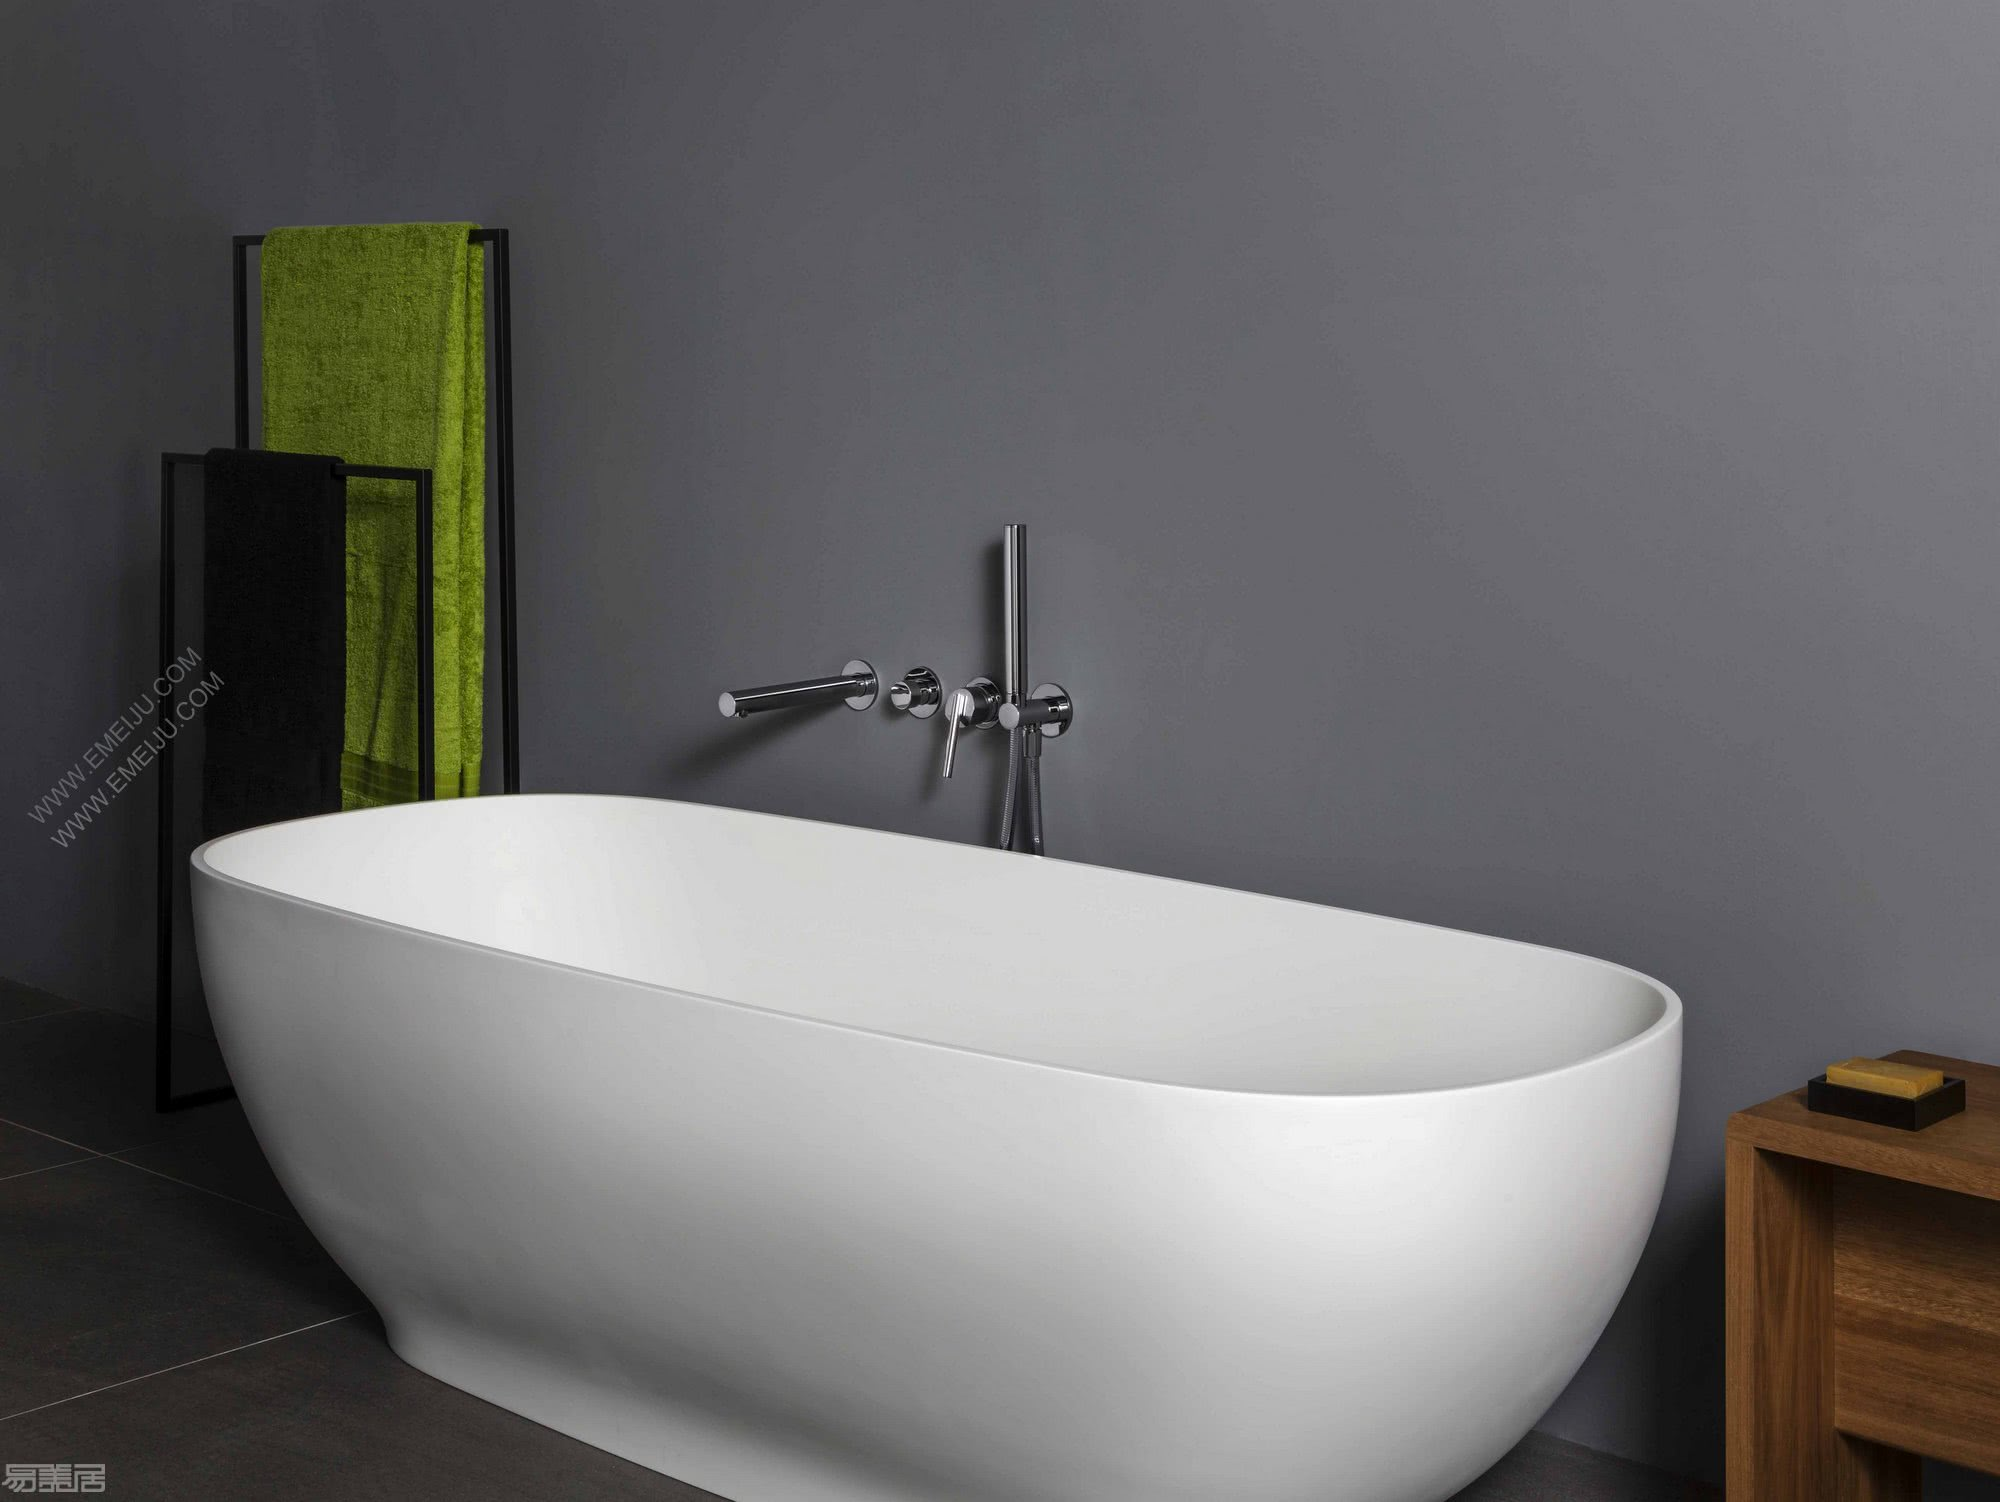 closer-bathtub-mixer-zucchetti-297323-relf8752145.jpg